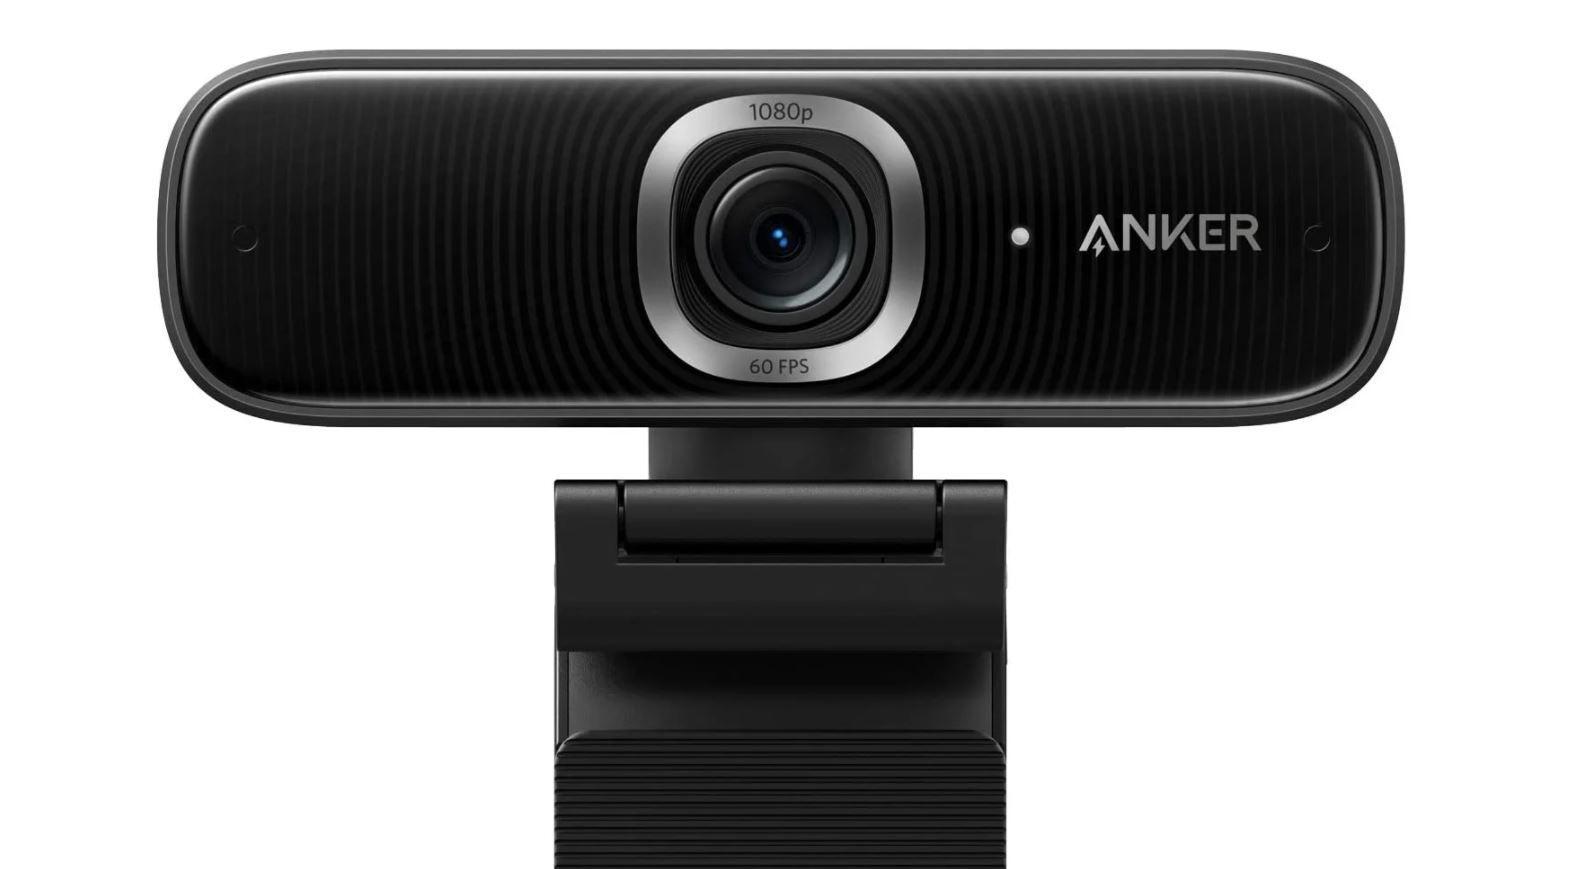 Anker PowerConf C300 AI-powered 1080p Webcam